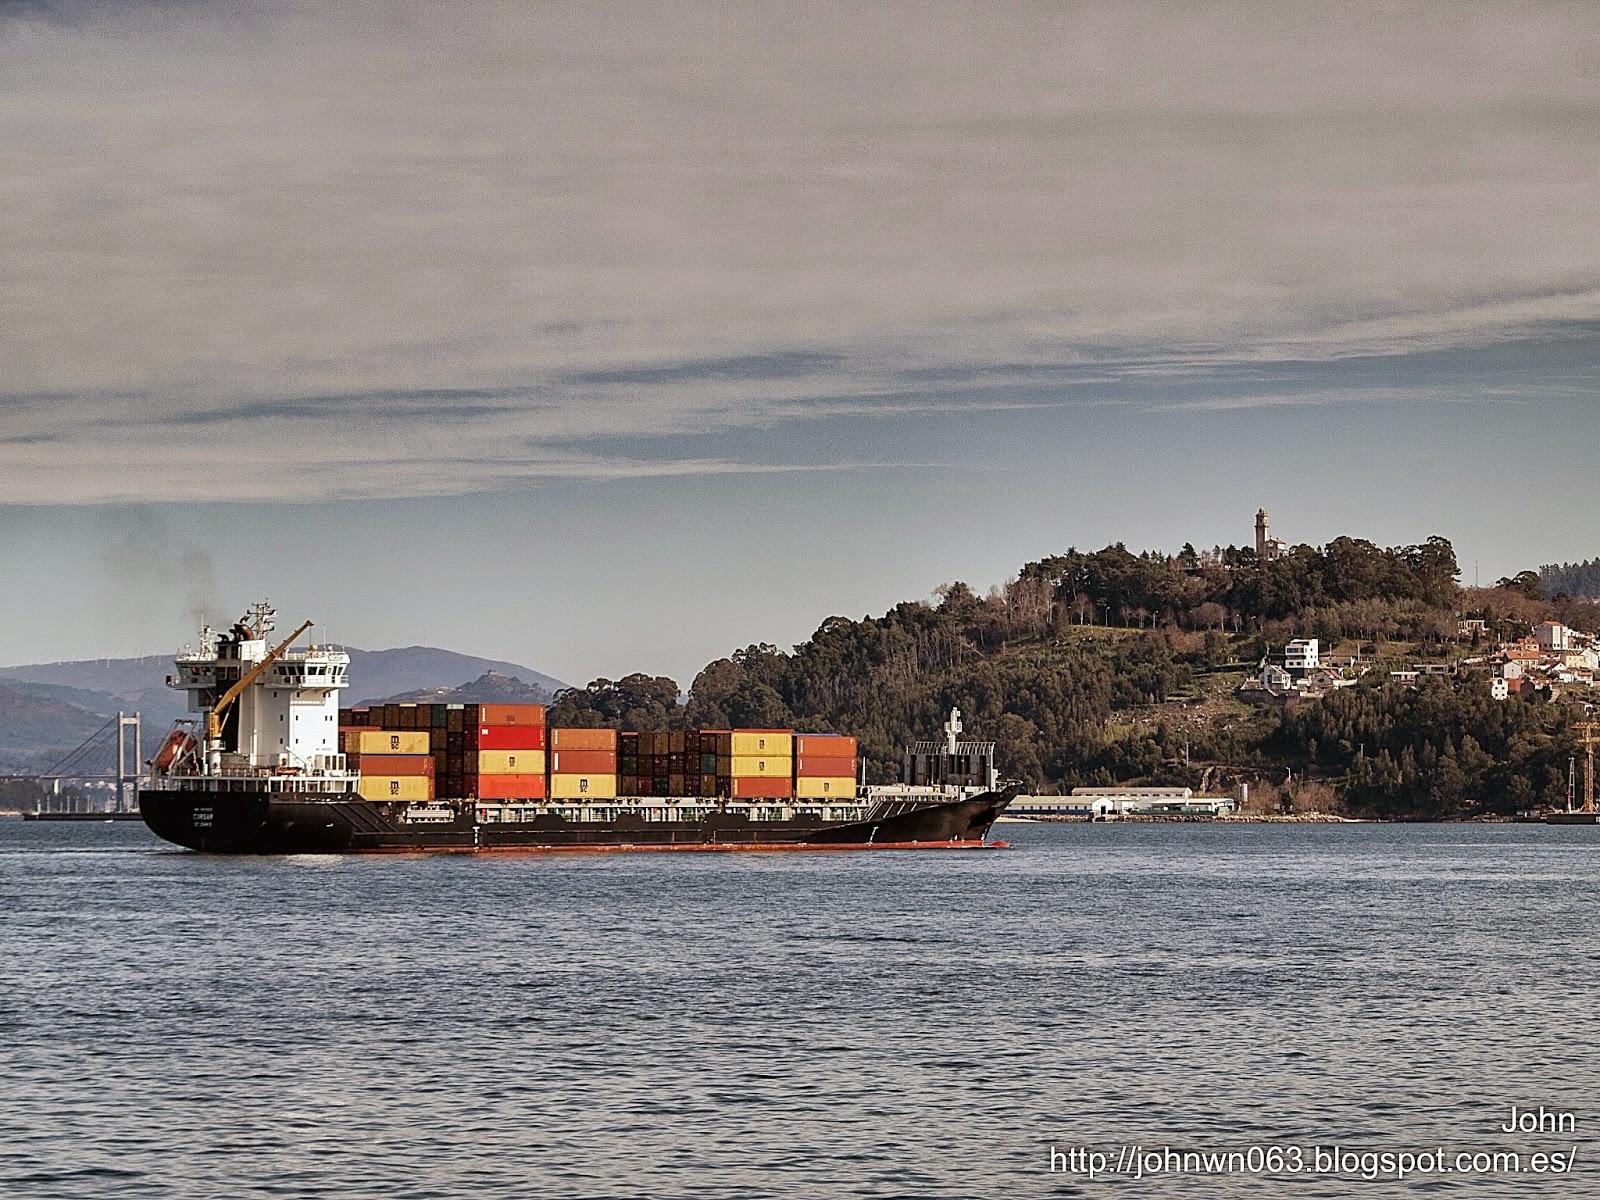 fotos de barcos, imagenes de barcos, corsar, containero, container ship, vigo